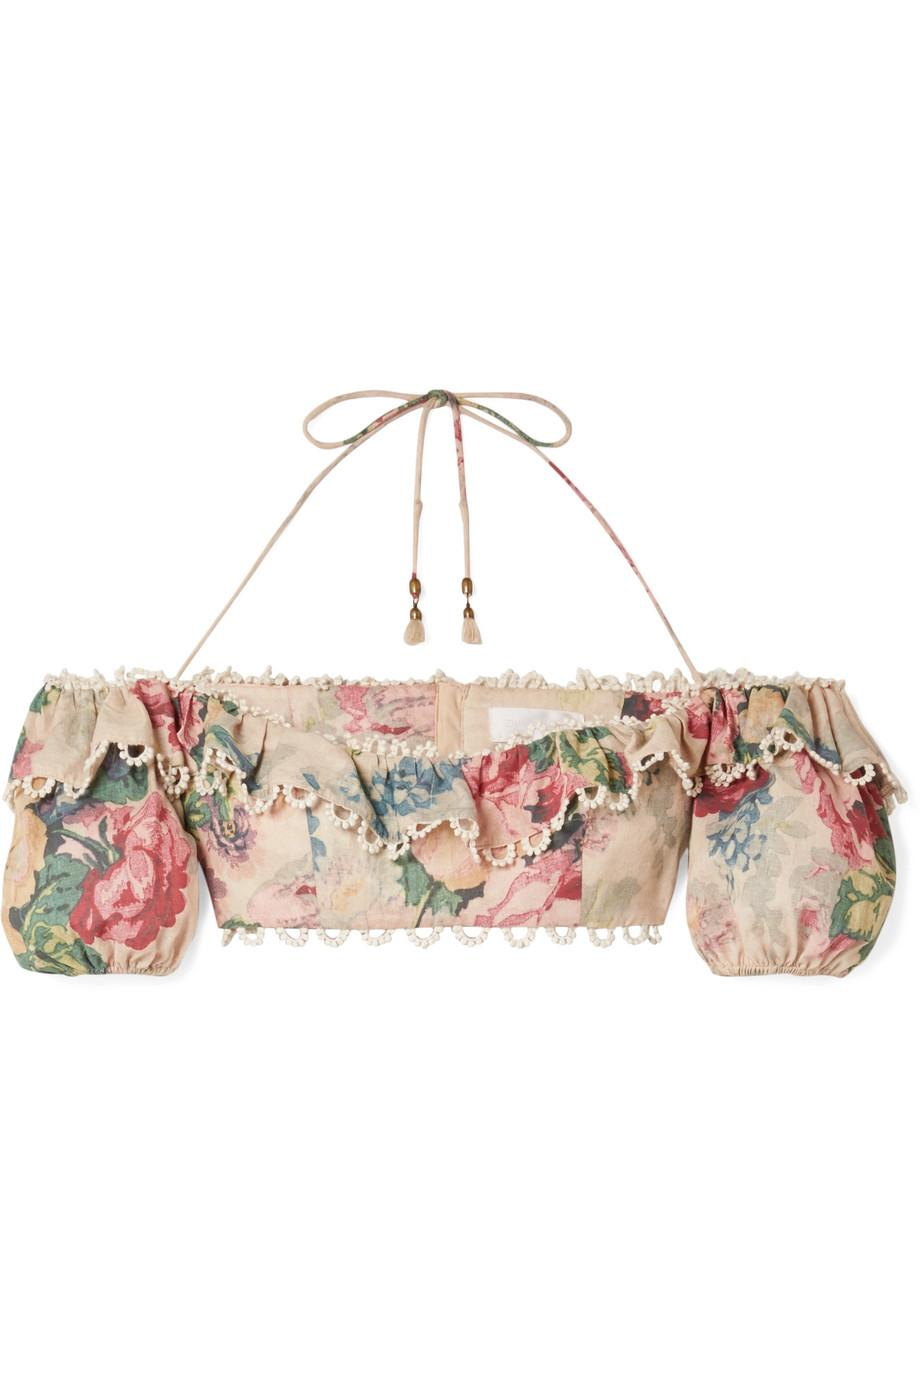 Melody Cropped Crochet-trimmed Floral-print Cotton-blend Top - Beige Zimmermann Deals Sale Online VNgkCY5U4